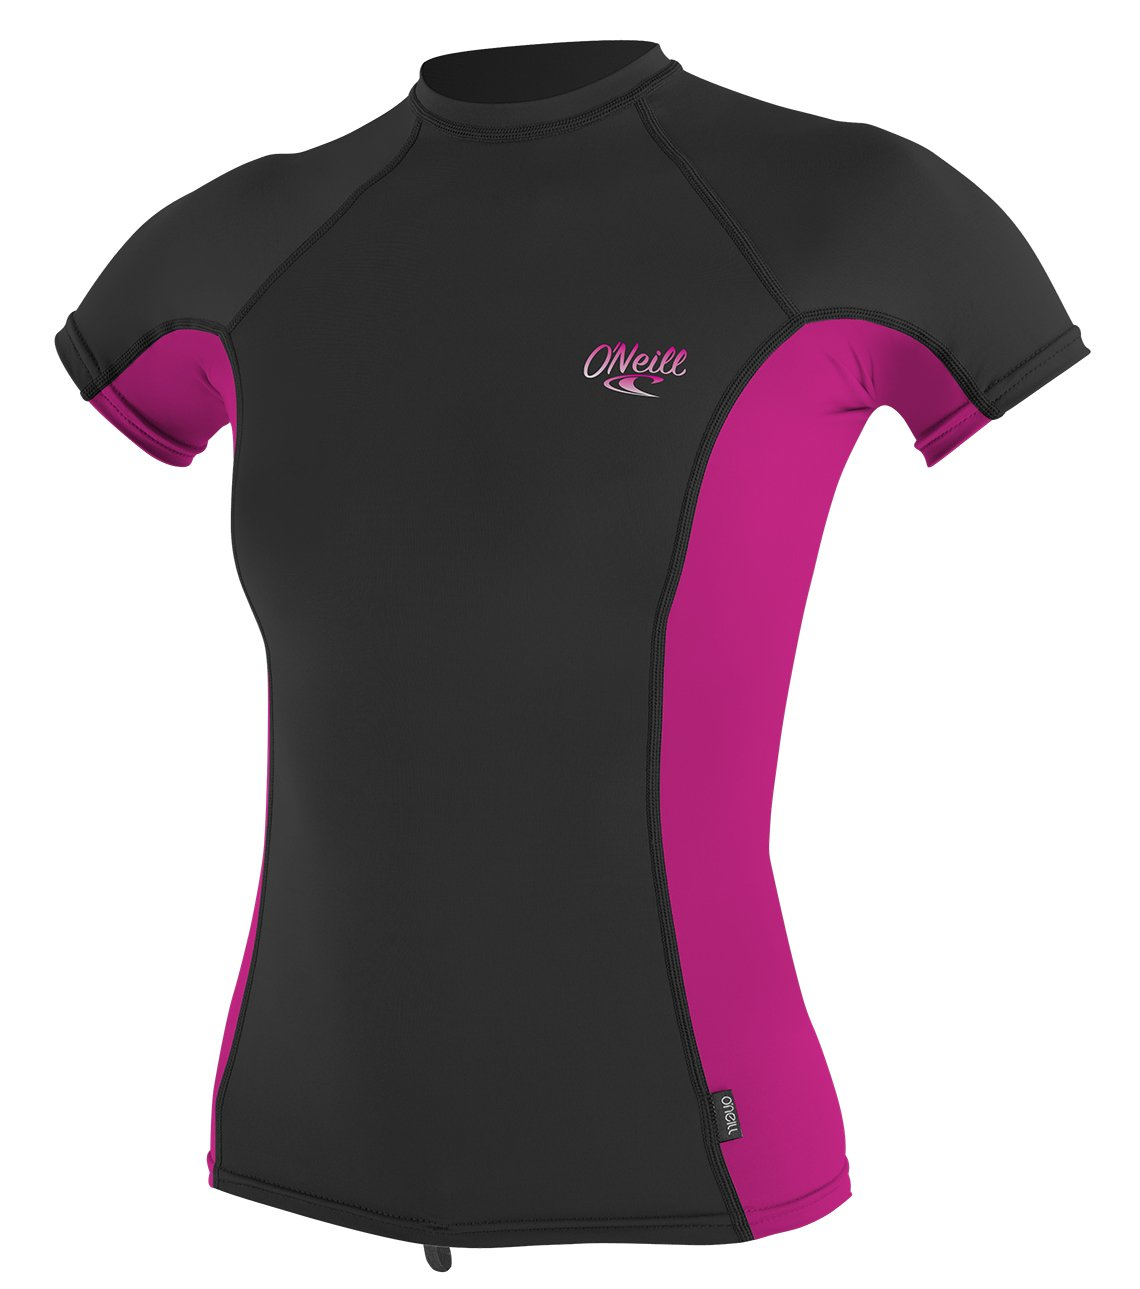 O'Neill Women's Premium Skins UPF 50+ Short Sleeve Rash Guard, Black/Berry, Small by O'Neill Wetsuits